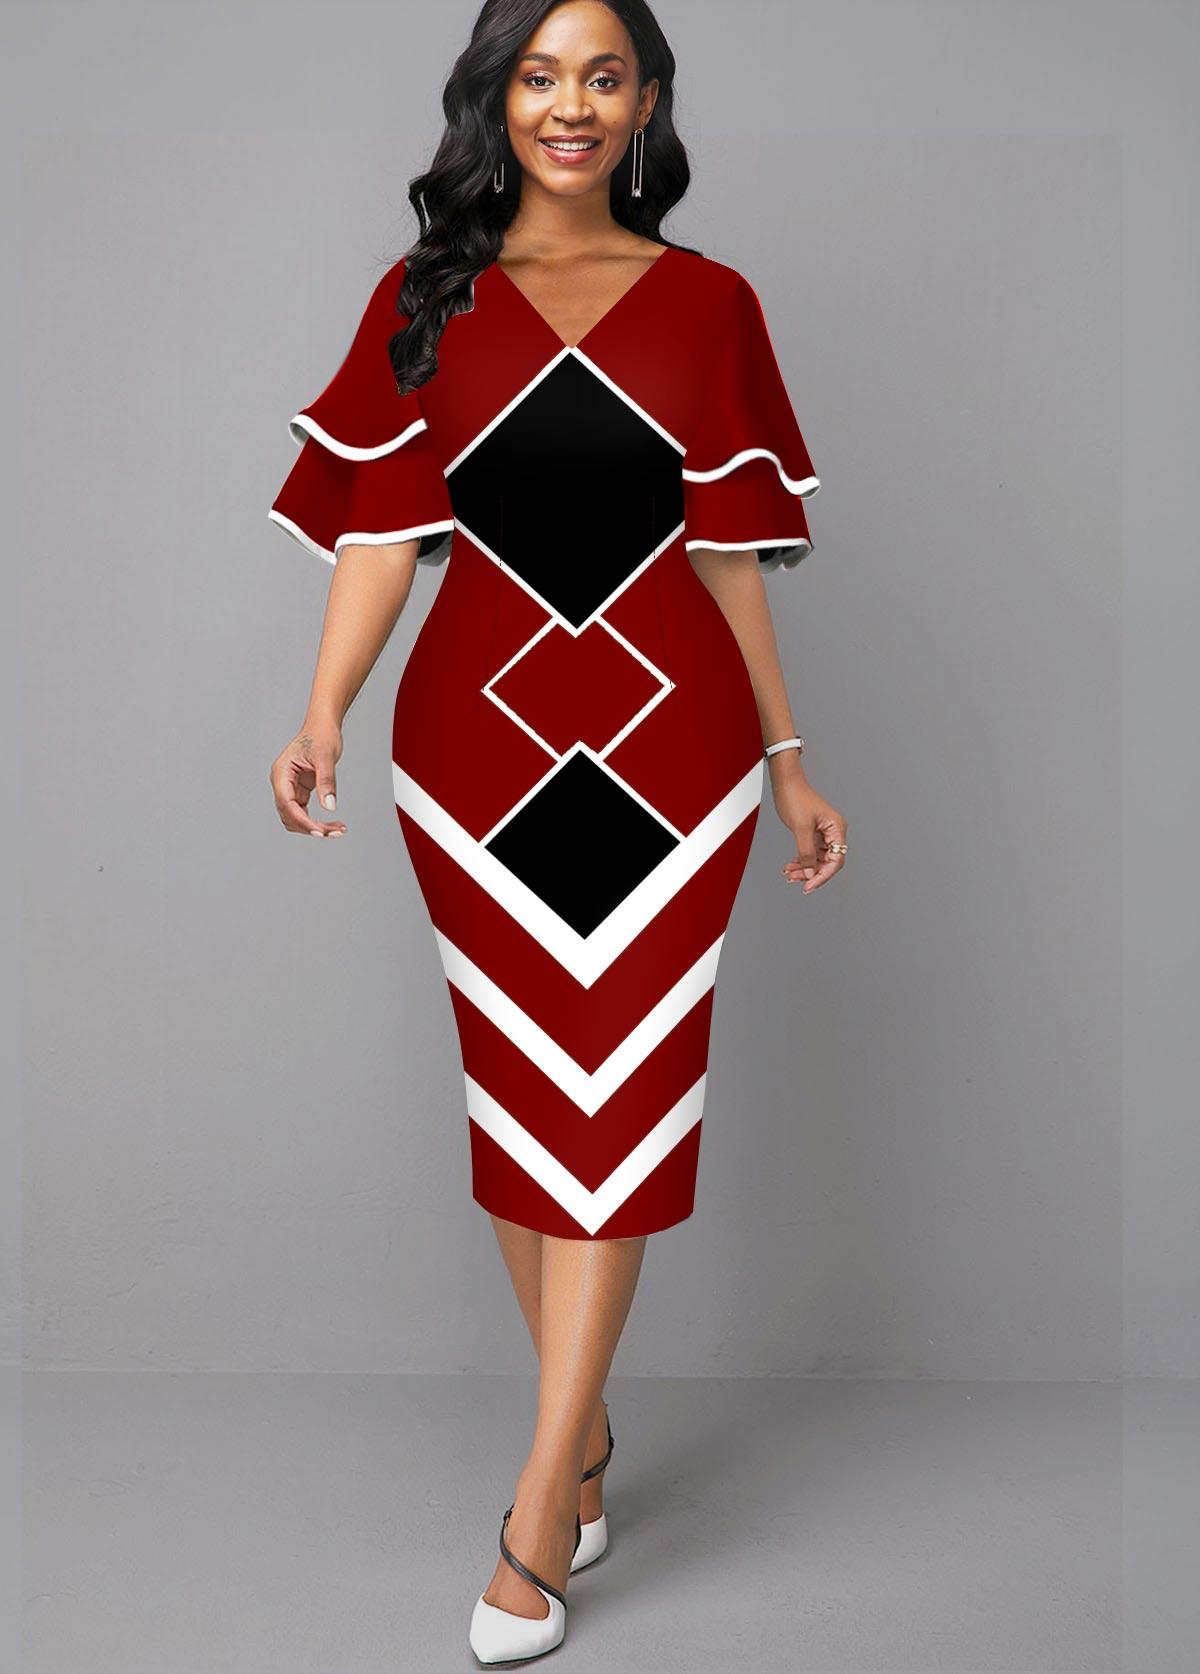 V Neck Geometric Print Layered Bell Sleeve Dress